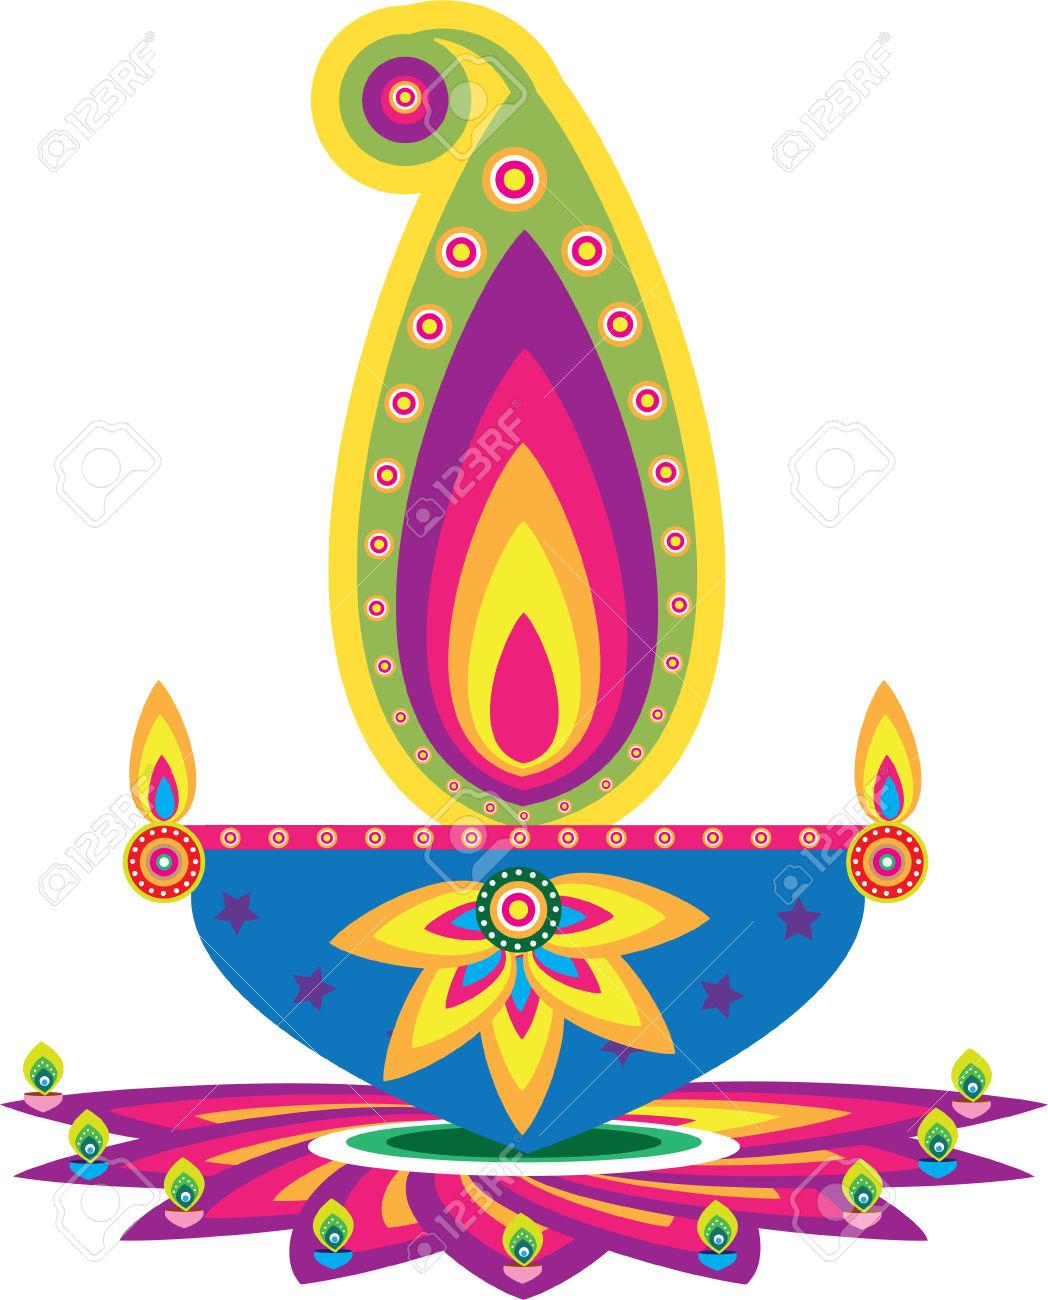 Deepavali lamp clipart banner free download Deepavali lamp clipart 3 » Clipart Station banner free download